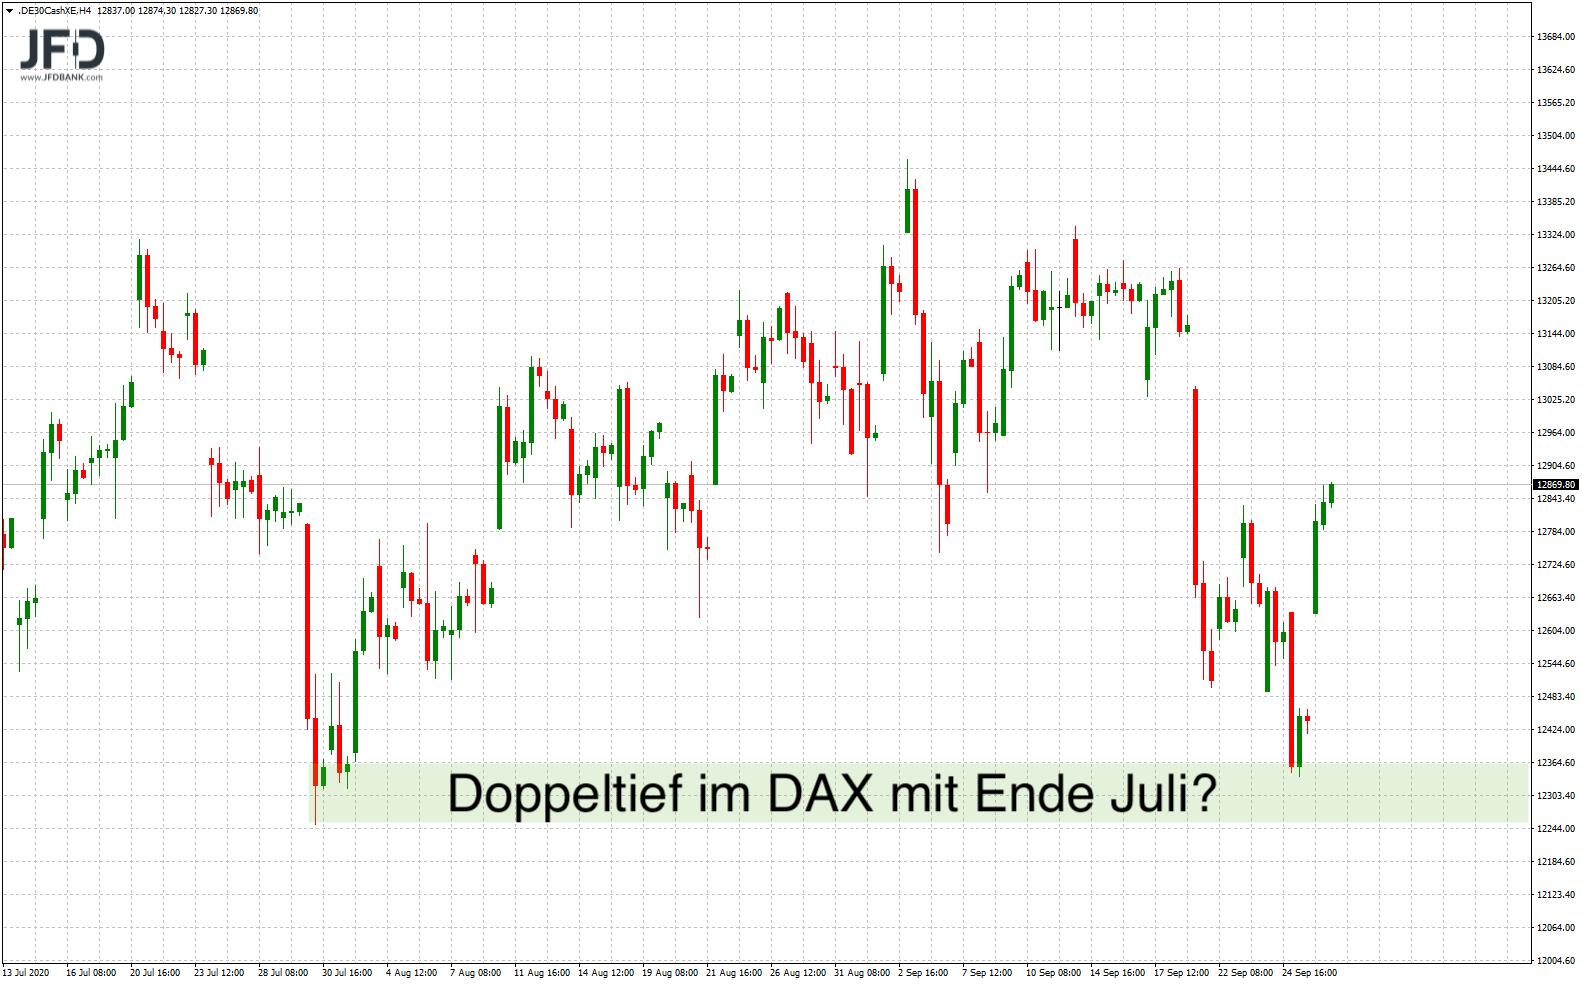 Szenario Doppel-Tief im DAX